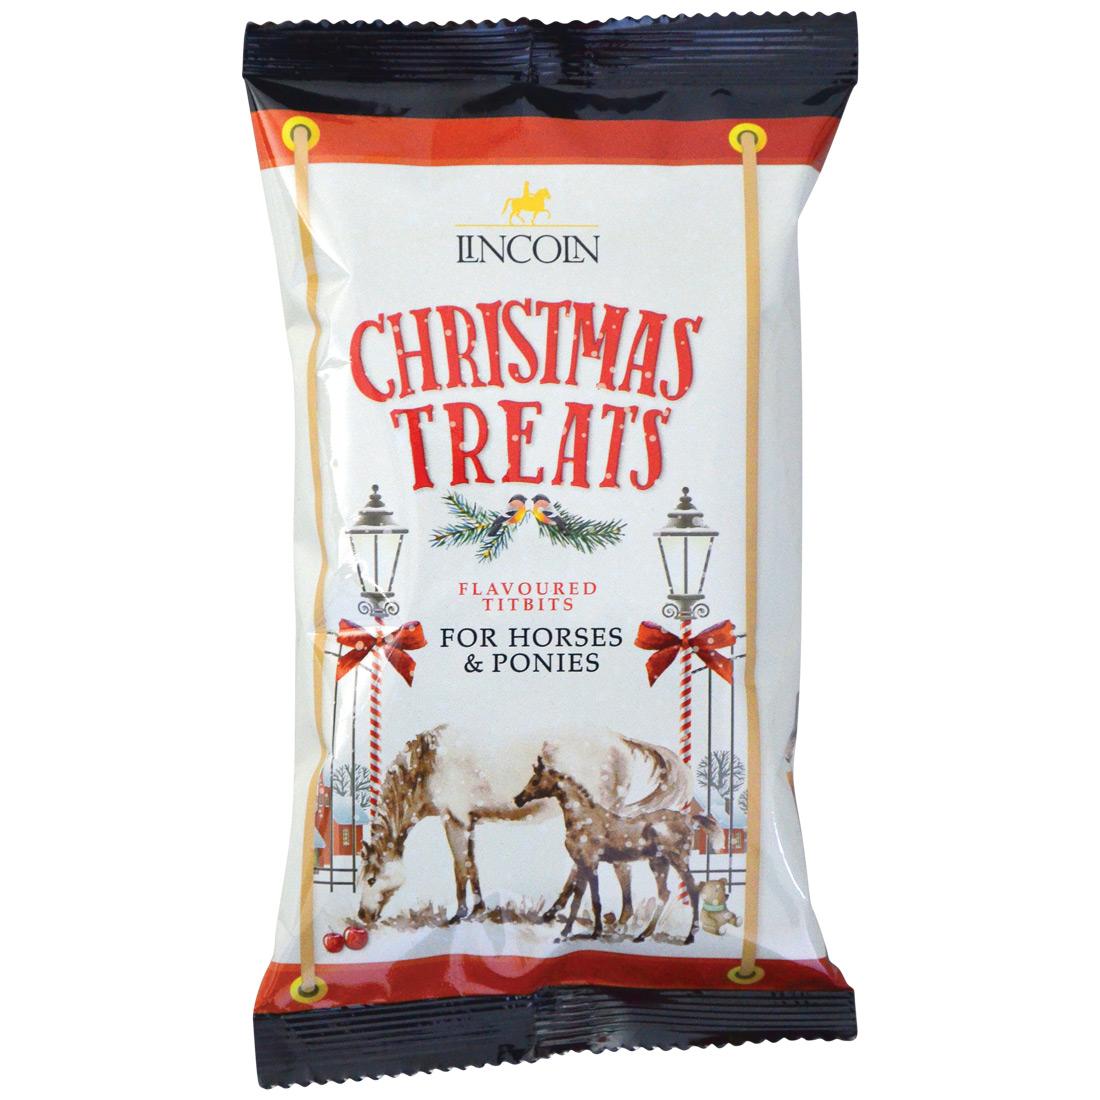 Lincoln Christmas Horse Treats